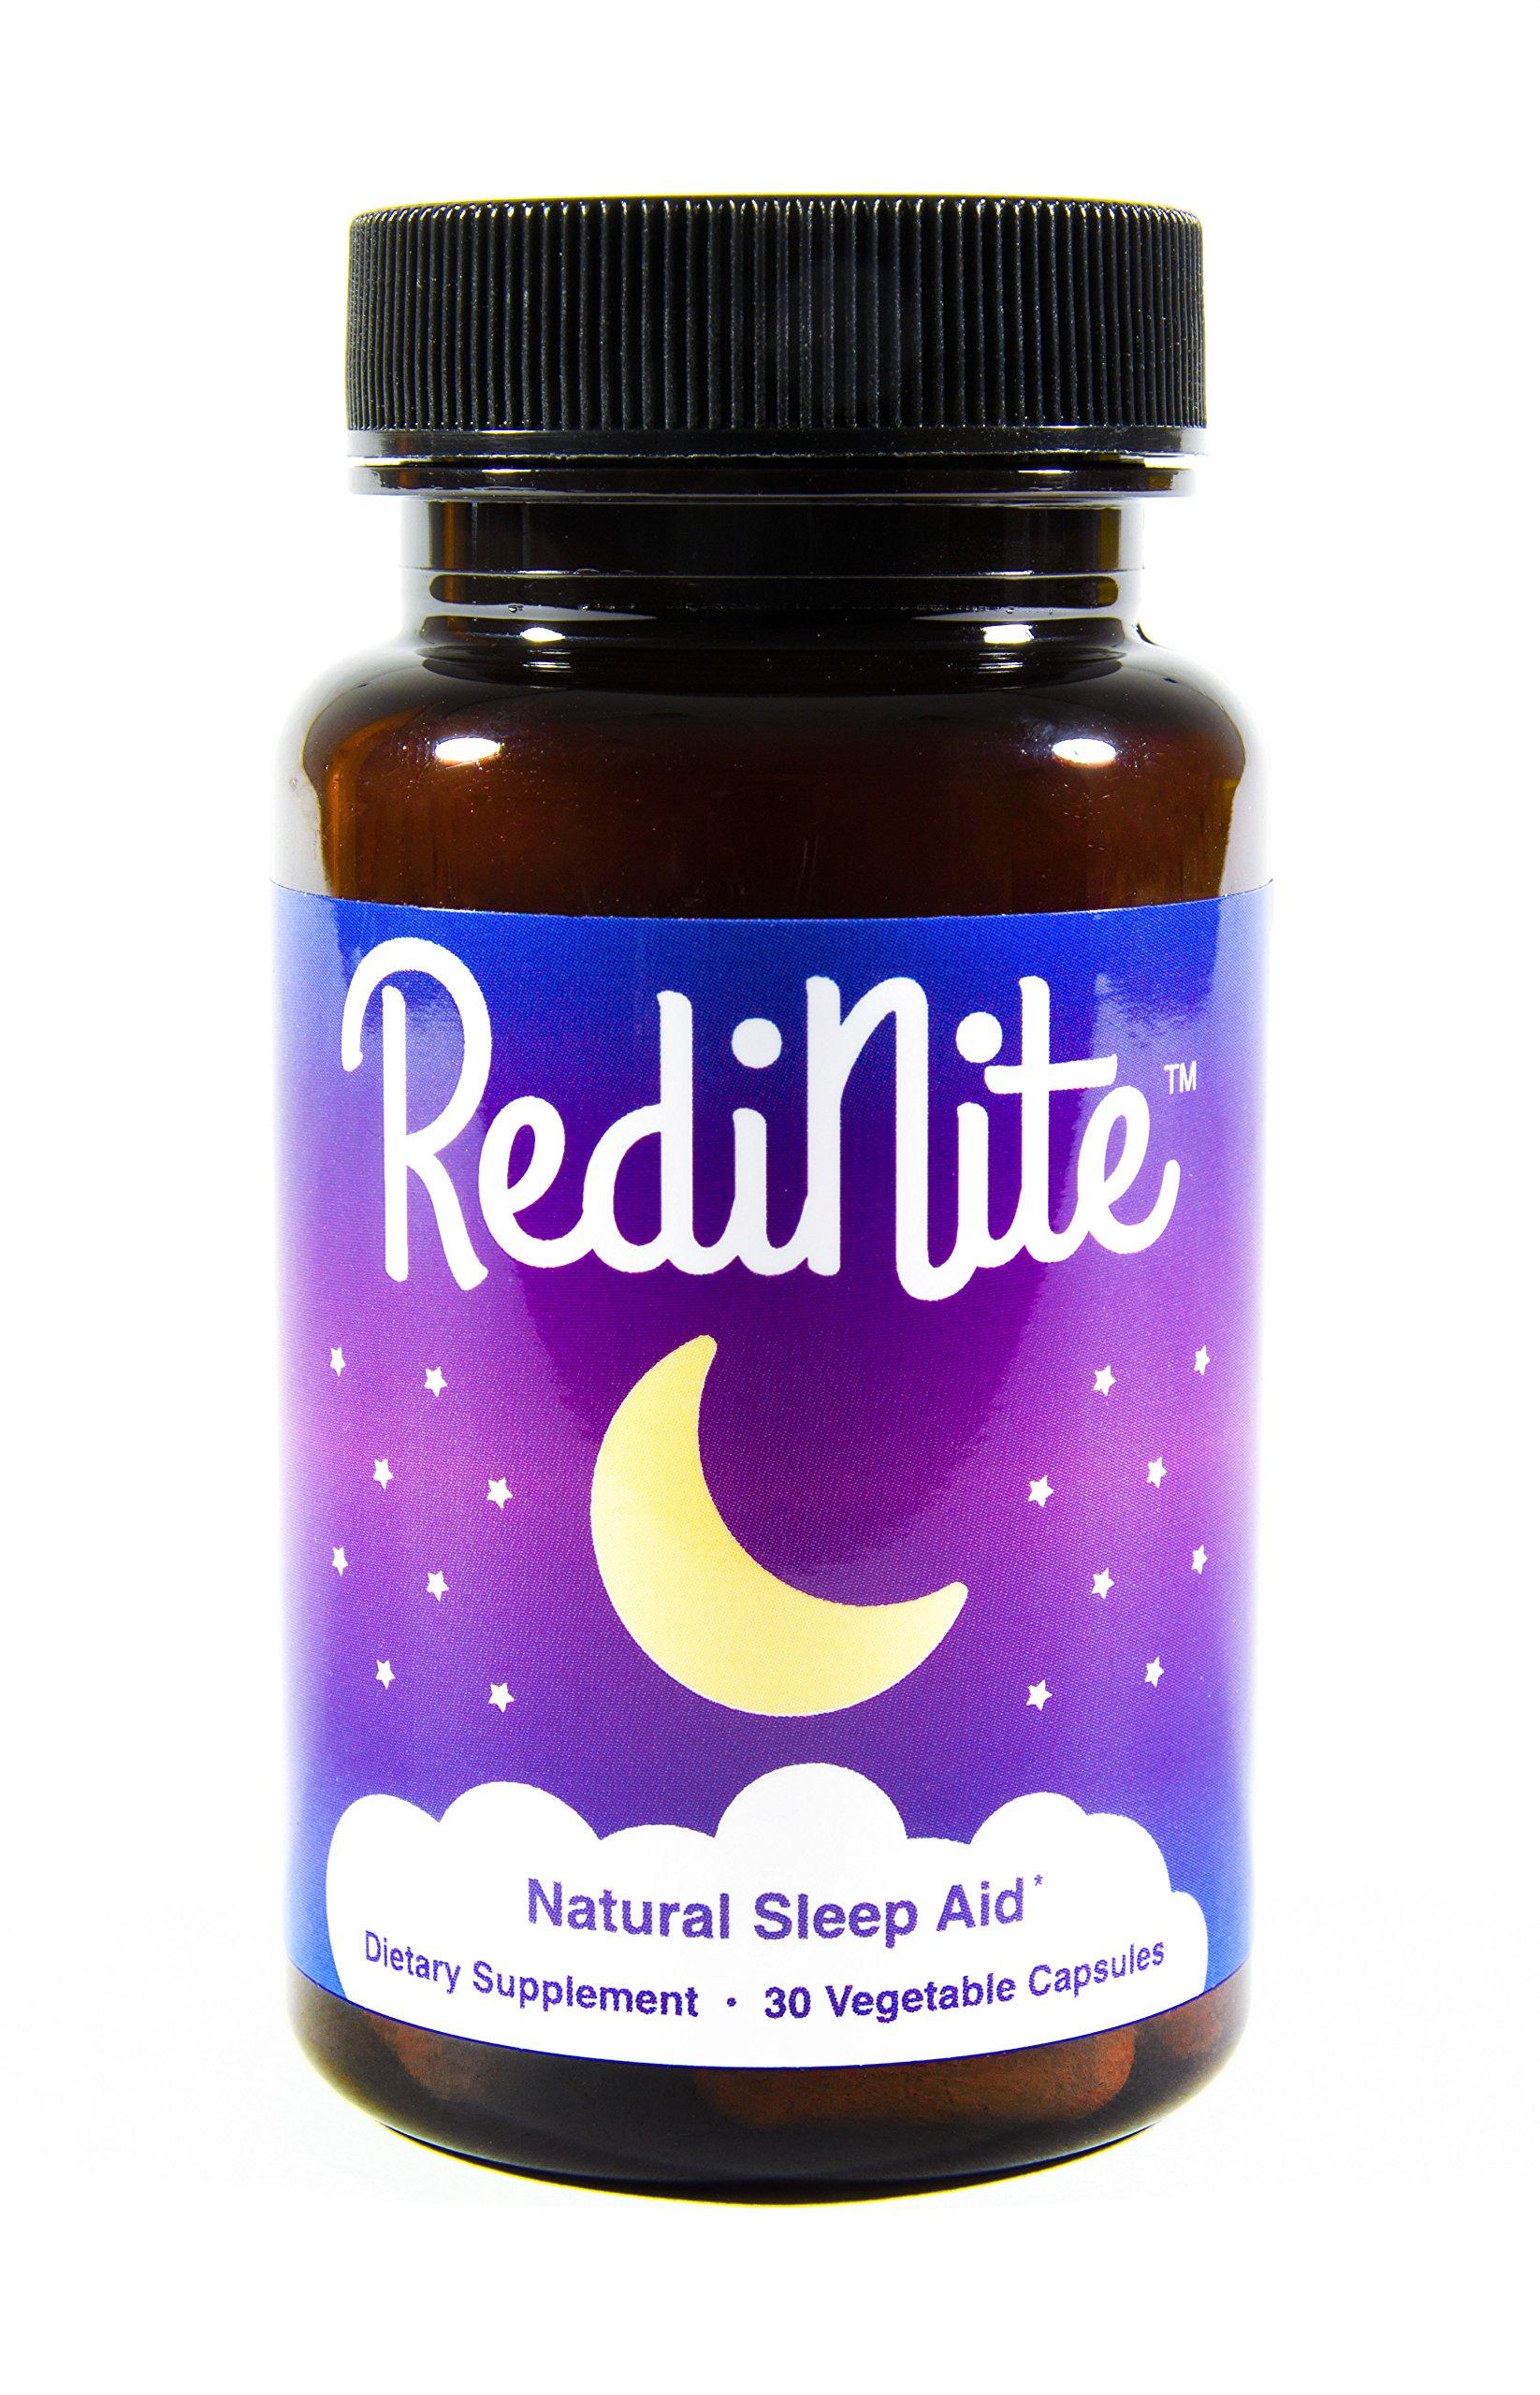 RediNite - Clinically-Proven Natural Sleep Aid Supplement - Non-GMO, Vegan, Gluten-Free by RediNite